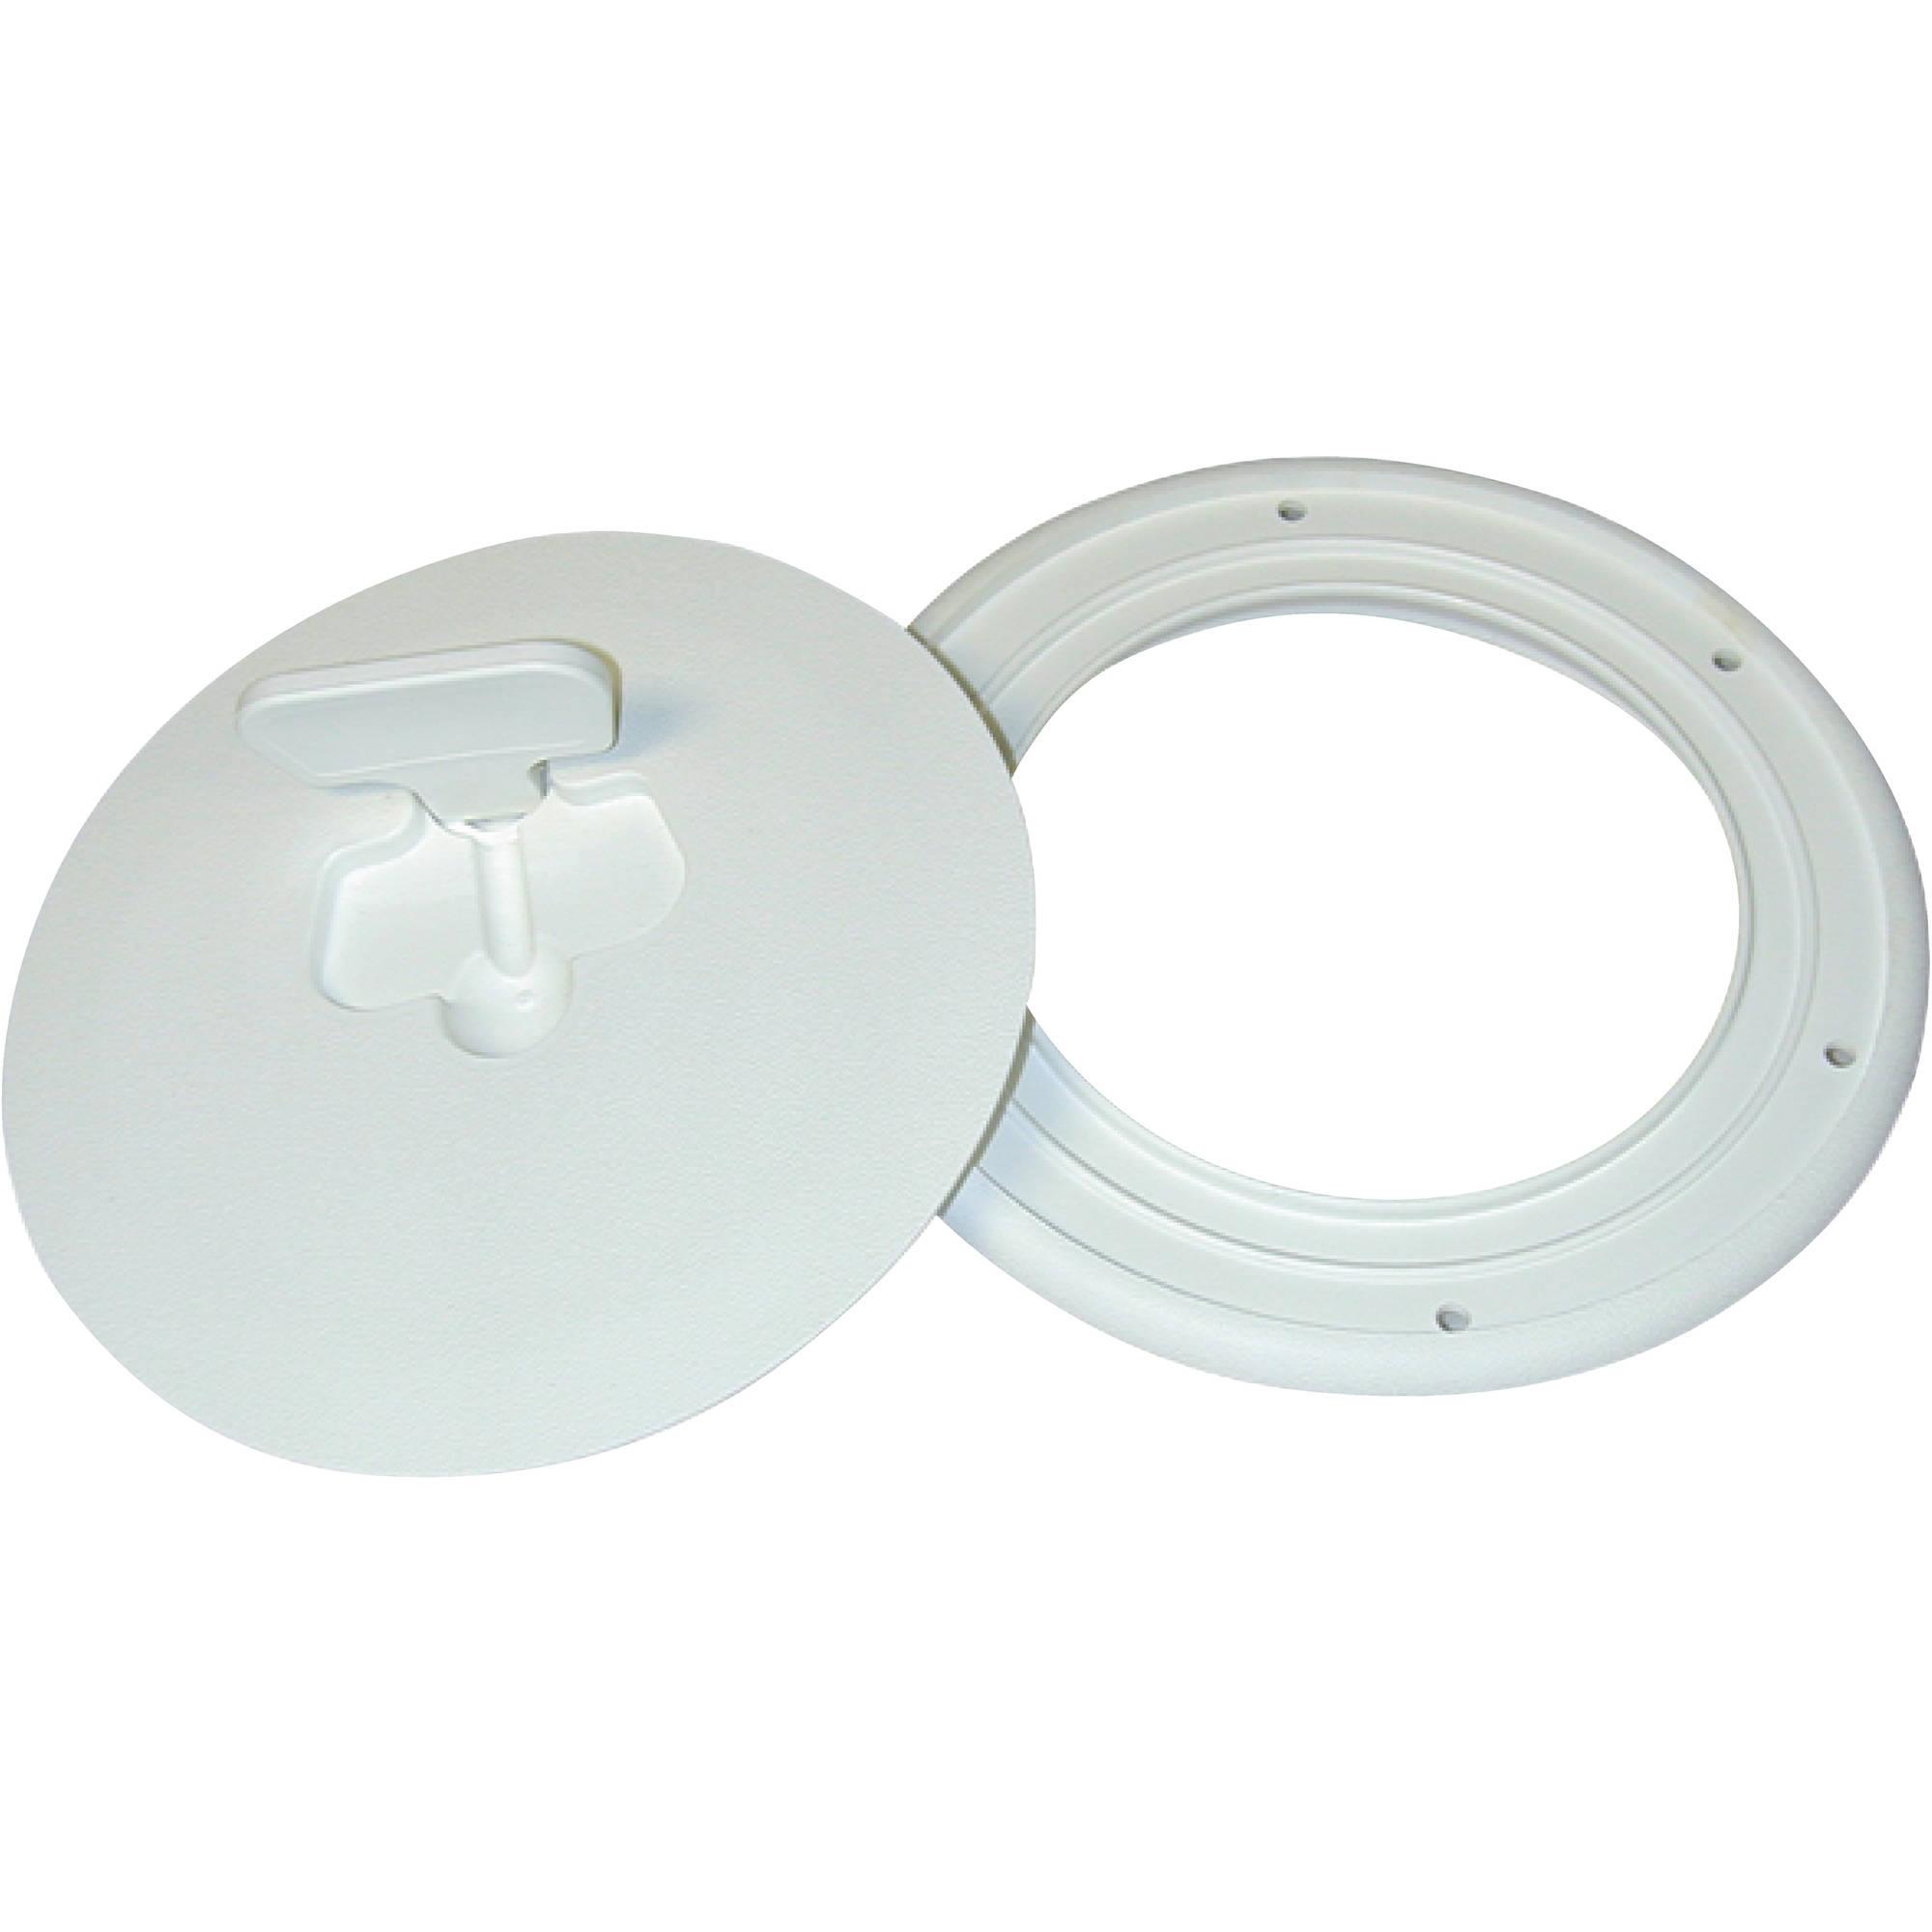 "T-H Marine Quick Release Deck Plate 6"" Diameter, Polar White by T-H Marine Supplies"